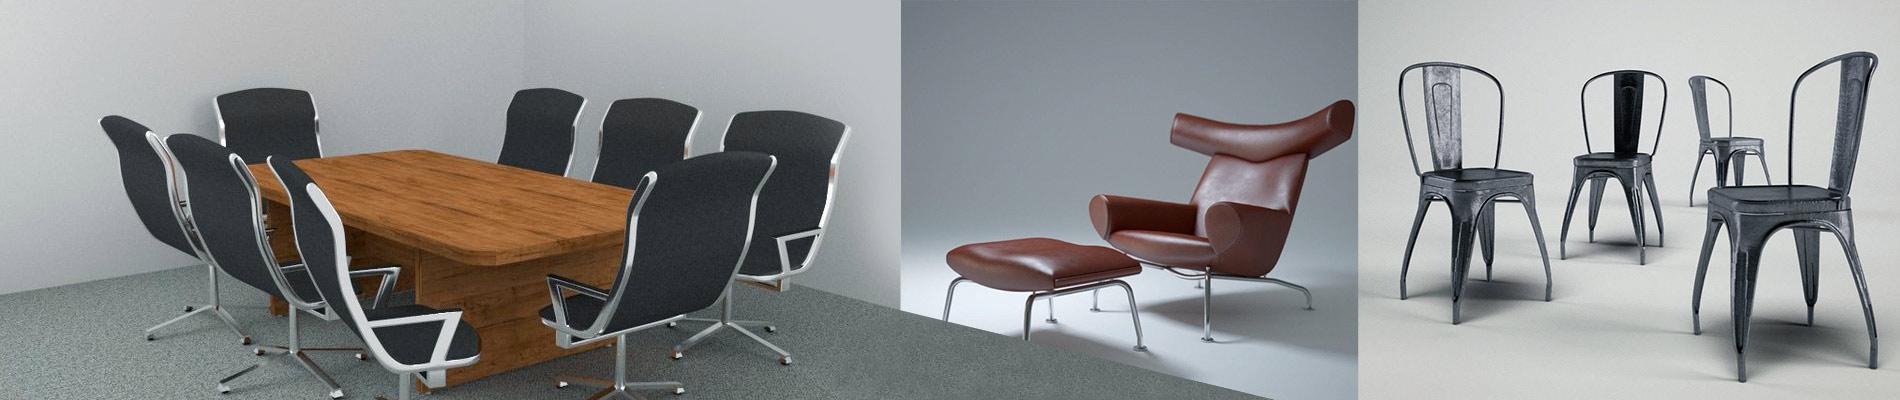 3D Furniture Rendering for Award-winning Product Manufacturer